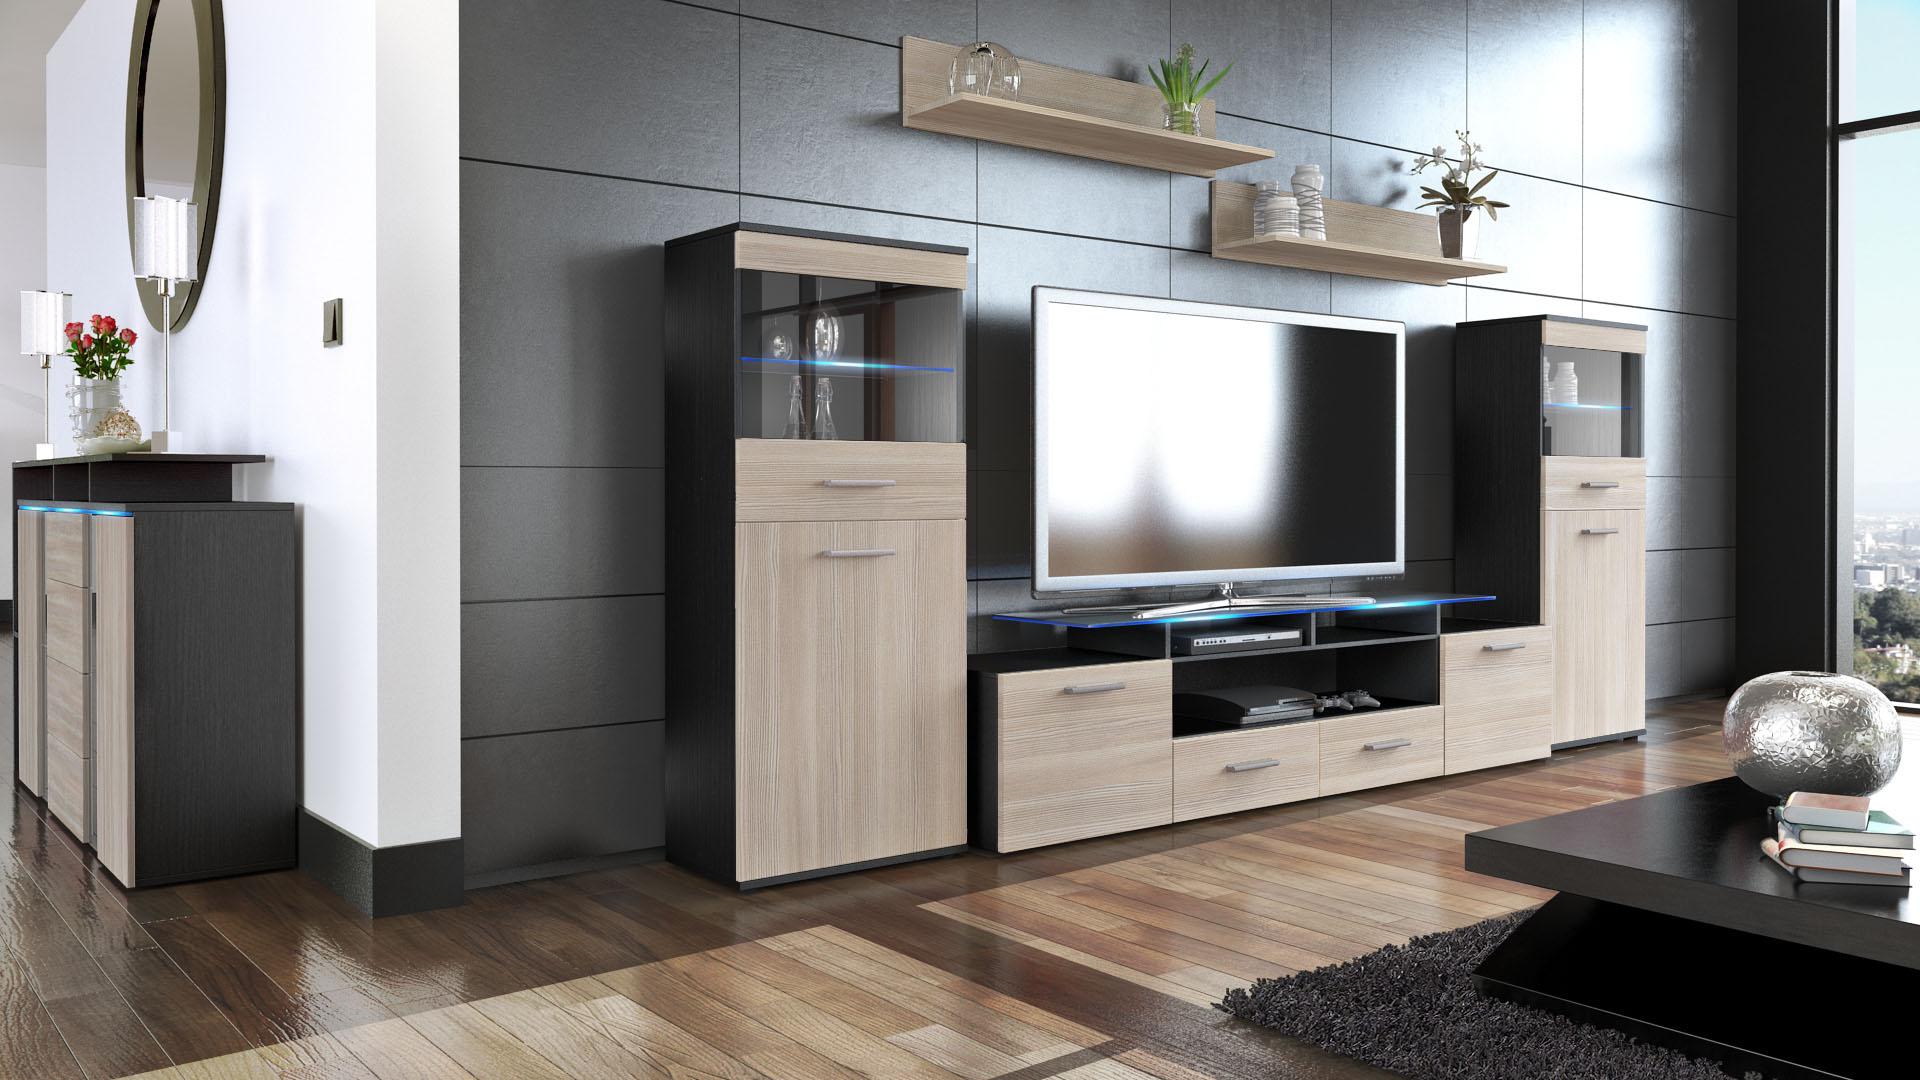 wohnwand schrankwand anbauwand vitrine 300cm schrank. Black Bedroom Furniture Sets. Home Design Ideas